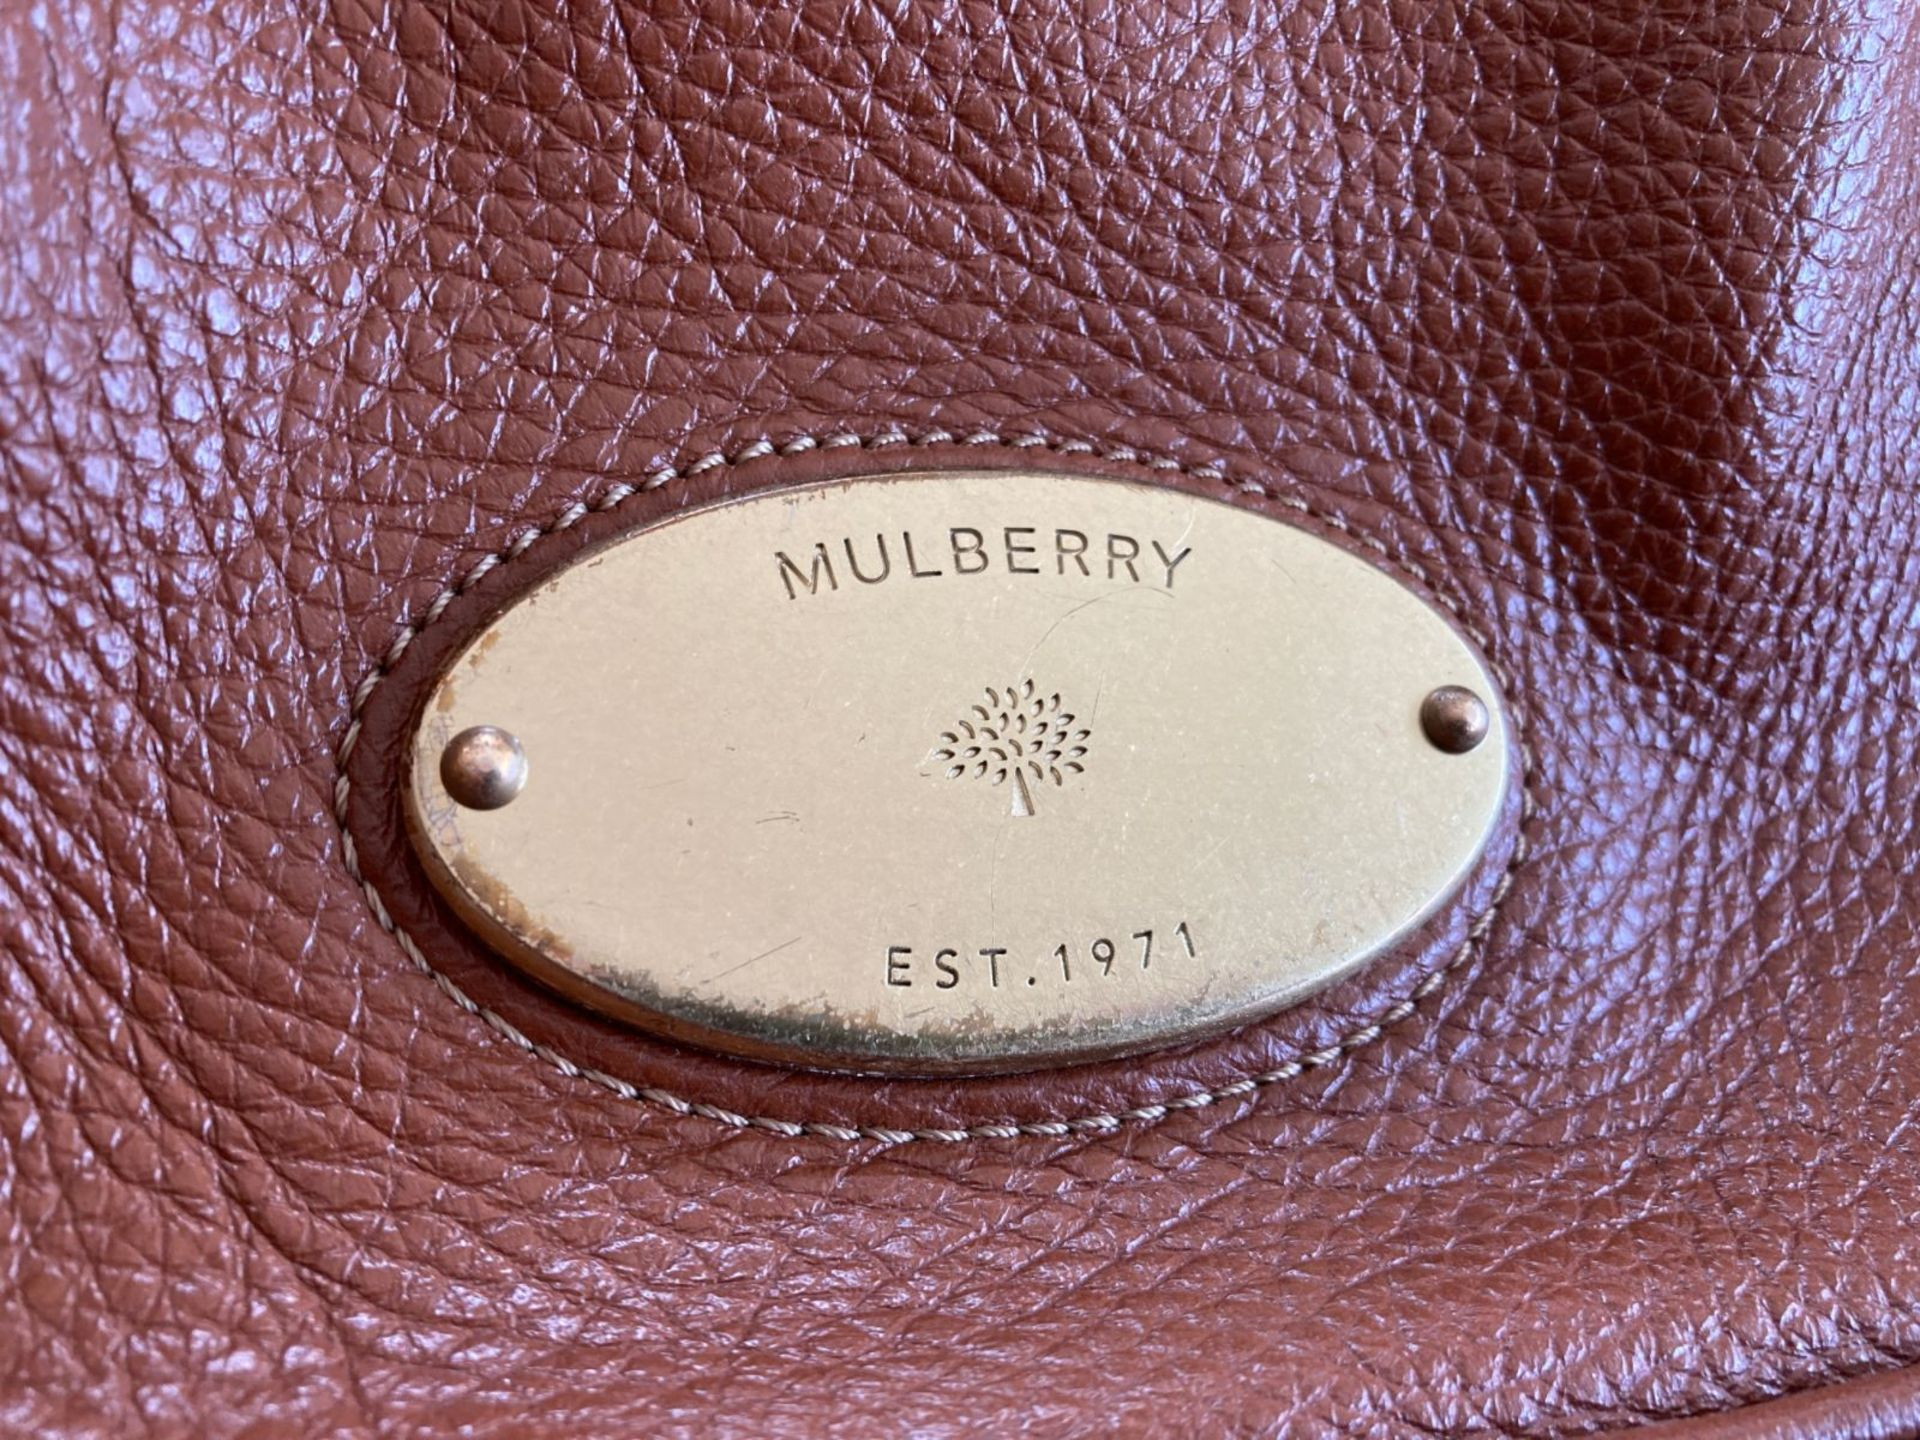 MULBERRY LEATHER HANDBAG - Image 2 of 6